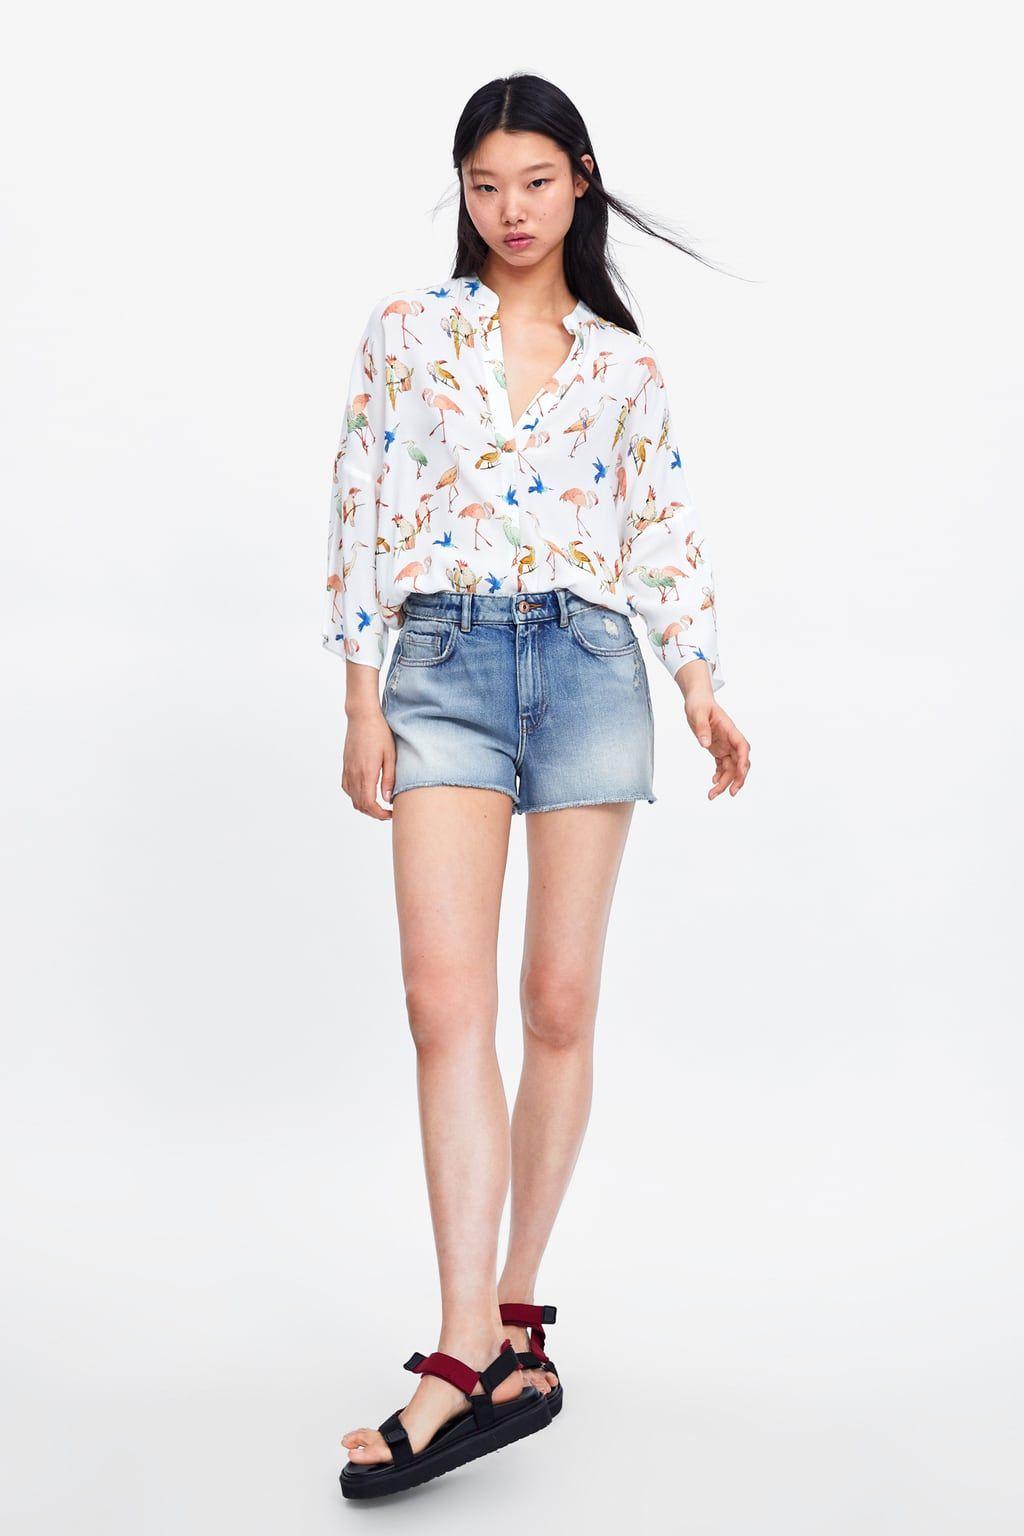 c5d00f99617 Animal print shirt in 2019 | Zara | Animal print shirts, Shirts ...